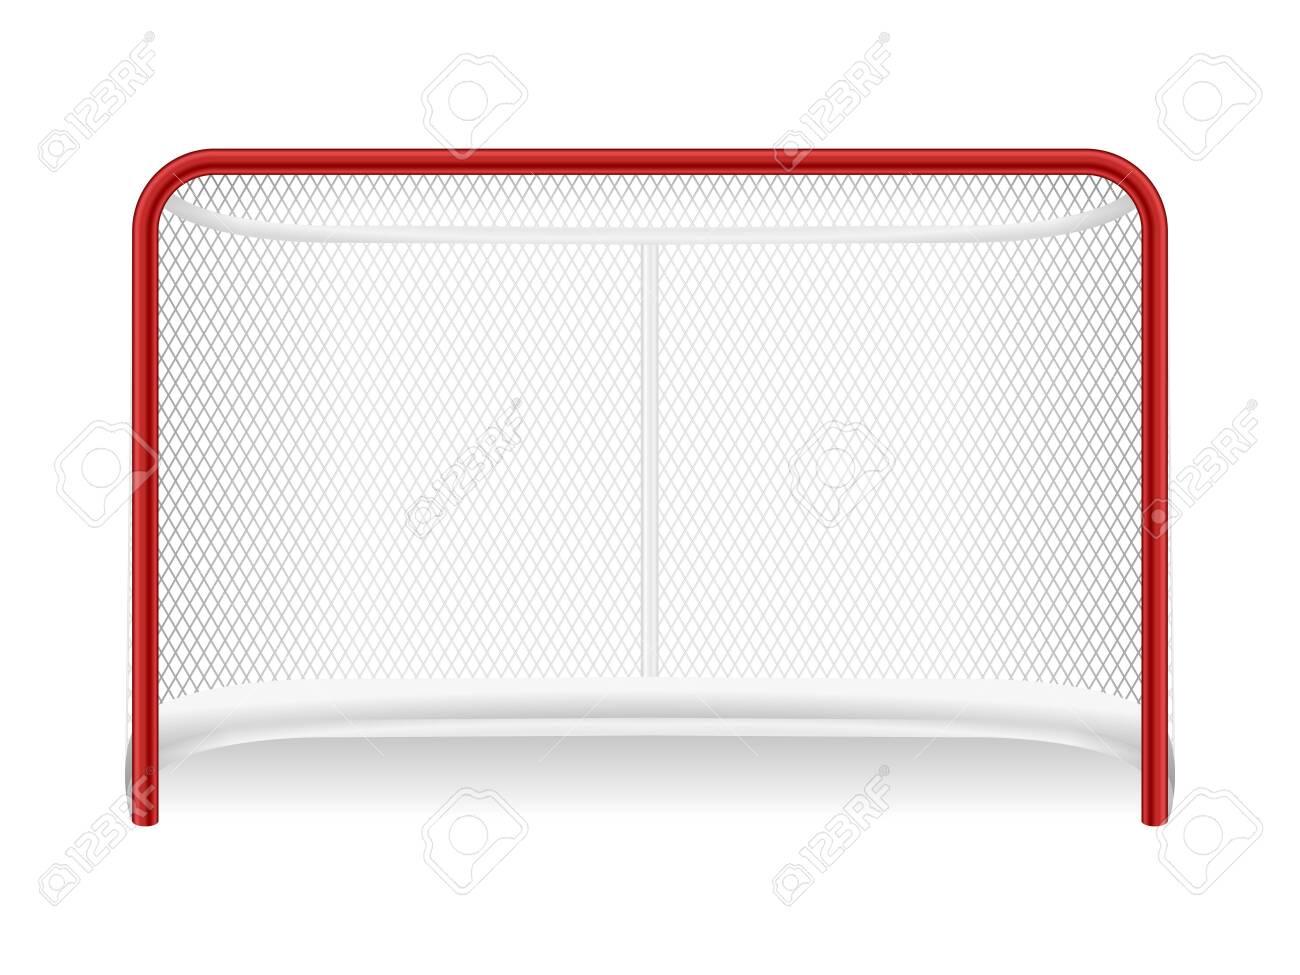 Hockey goal on a white background. Vector illustration. - 138596995